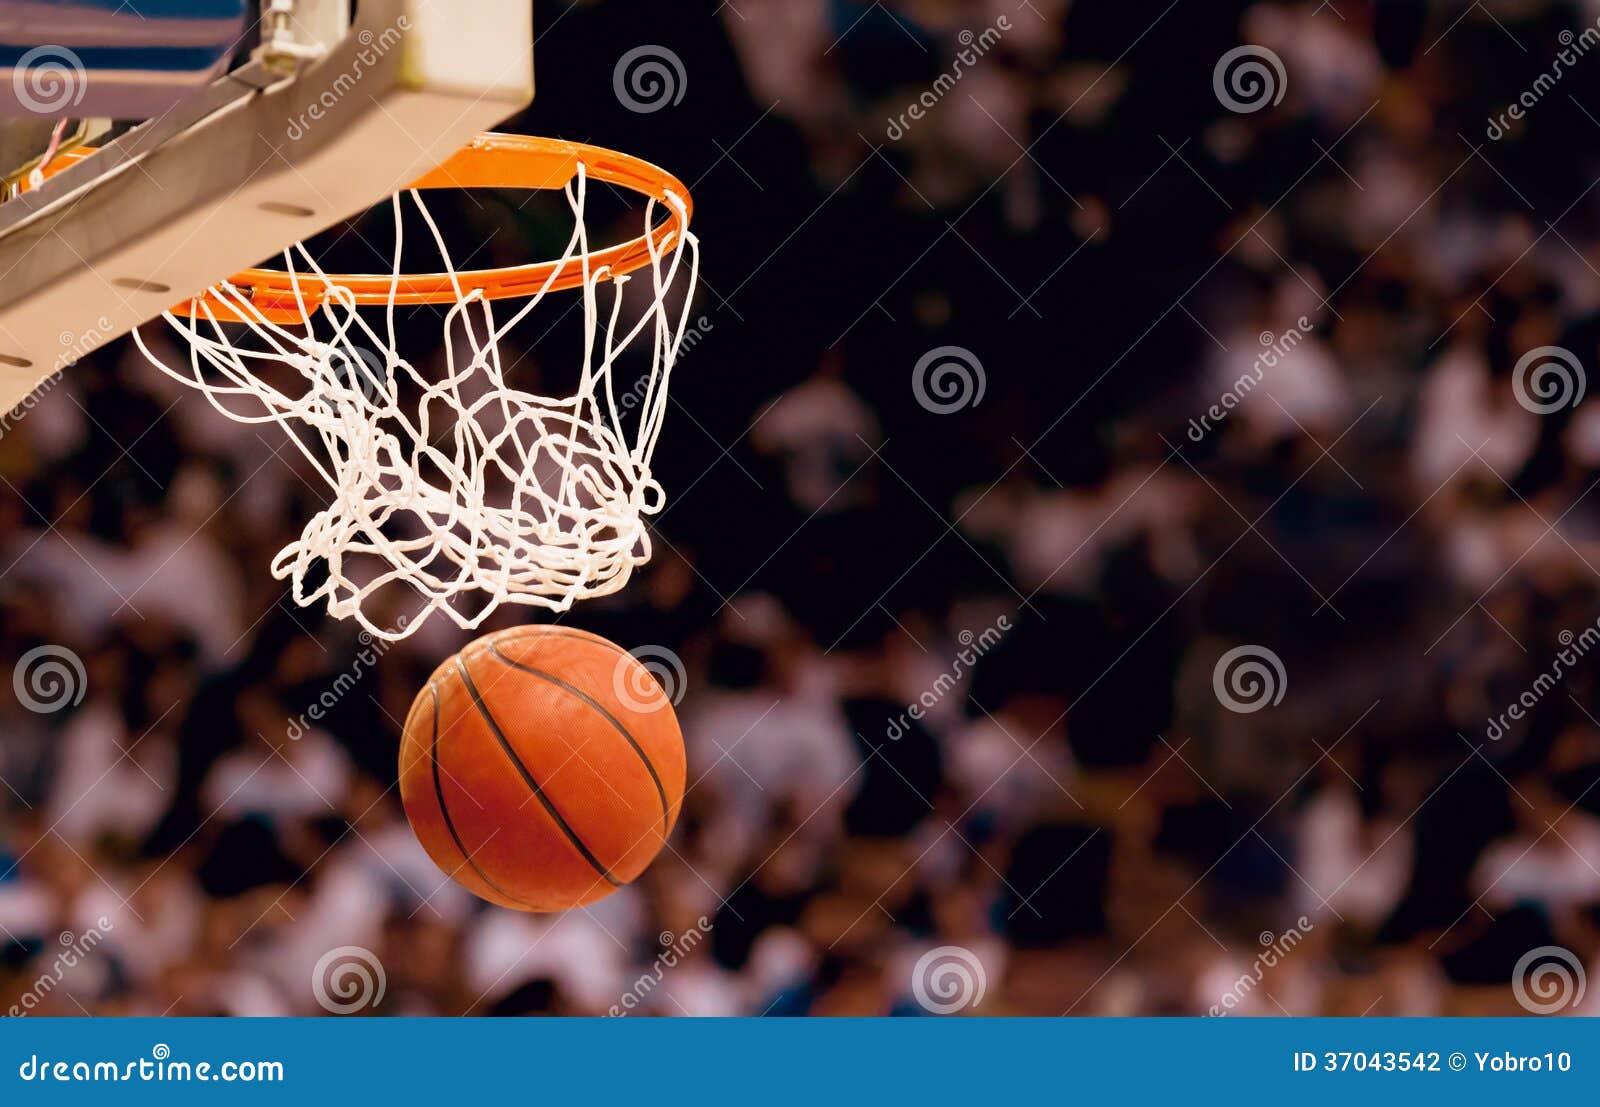 basketball scoring points stock photo image of points 37043542